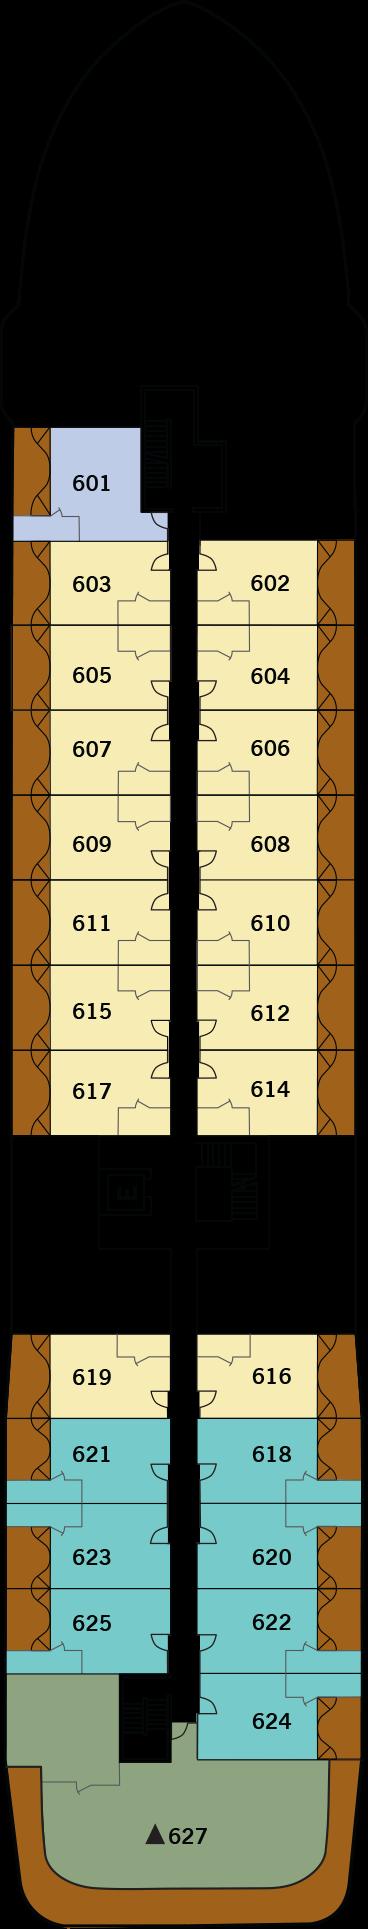 Silver Origin Deck 6: Deck 6